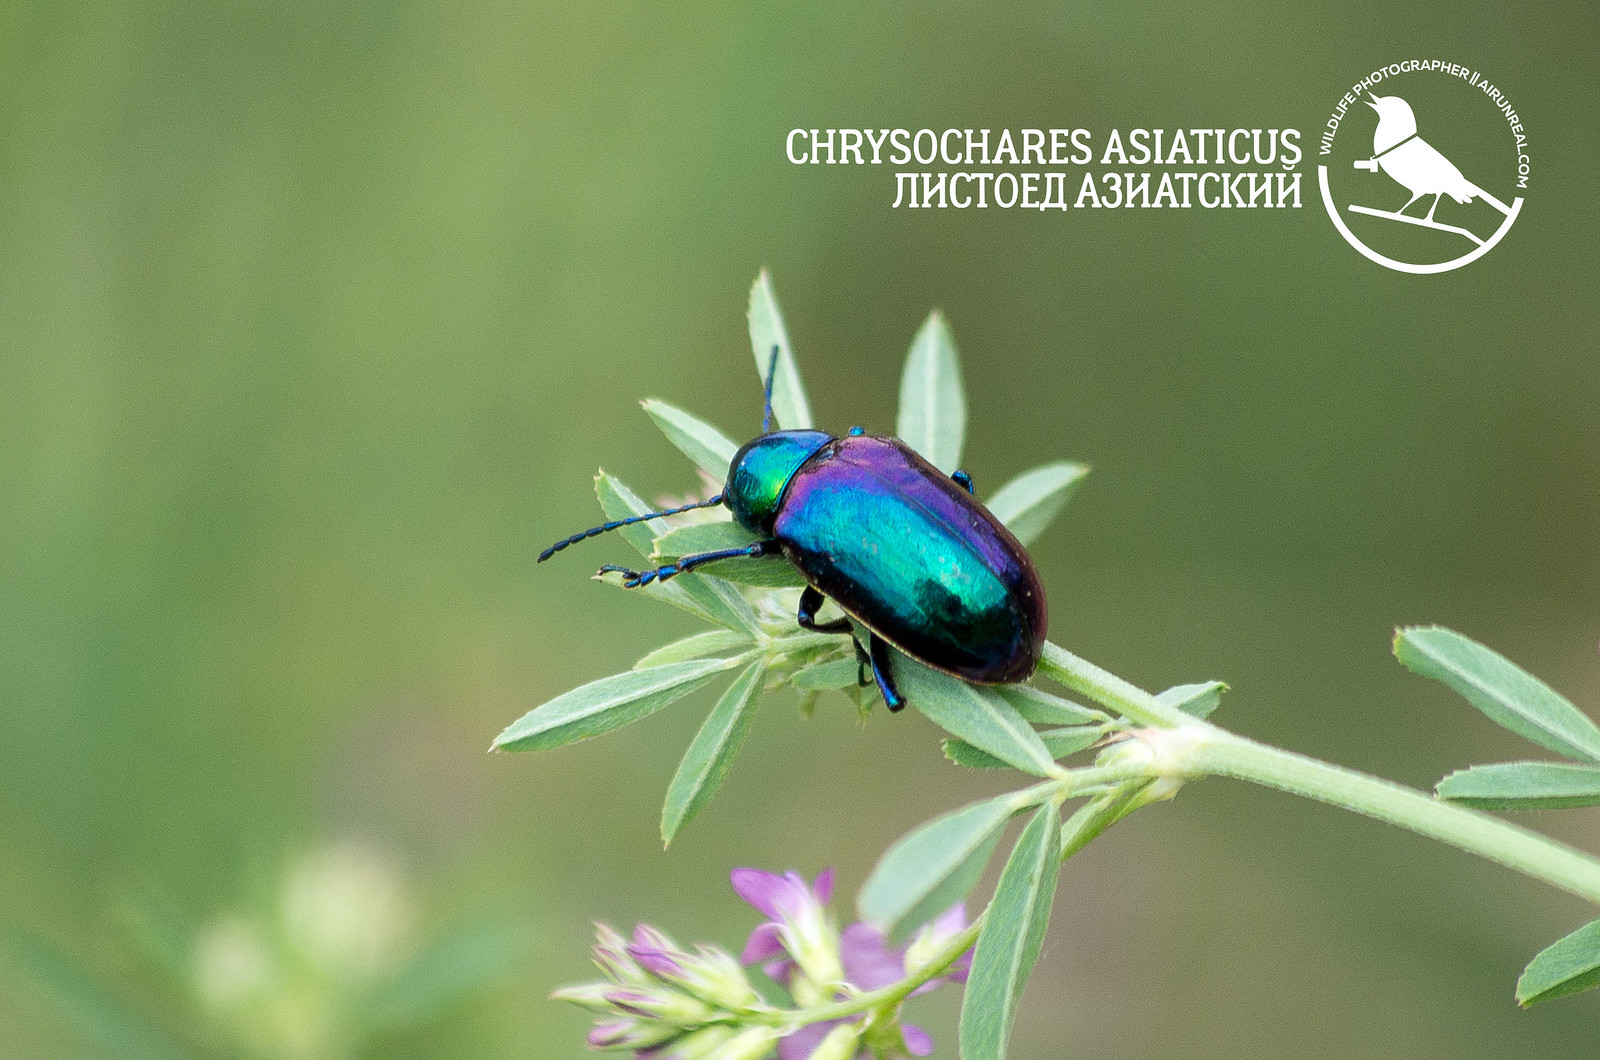 Chrysochares asiaticus // 08042017